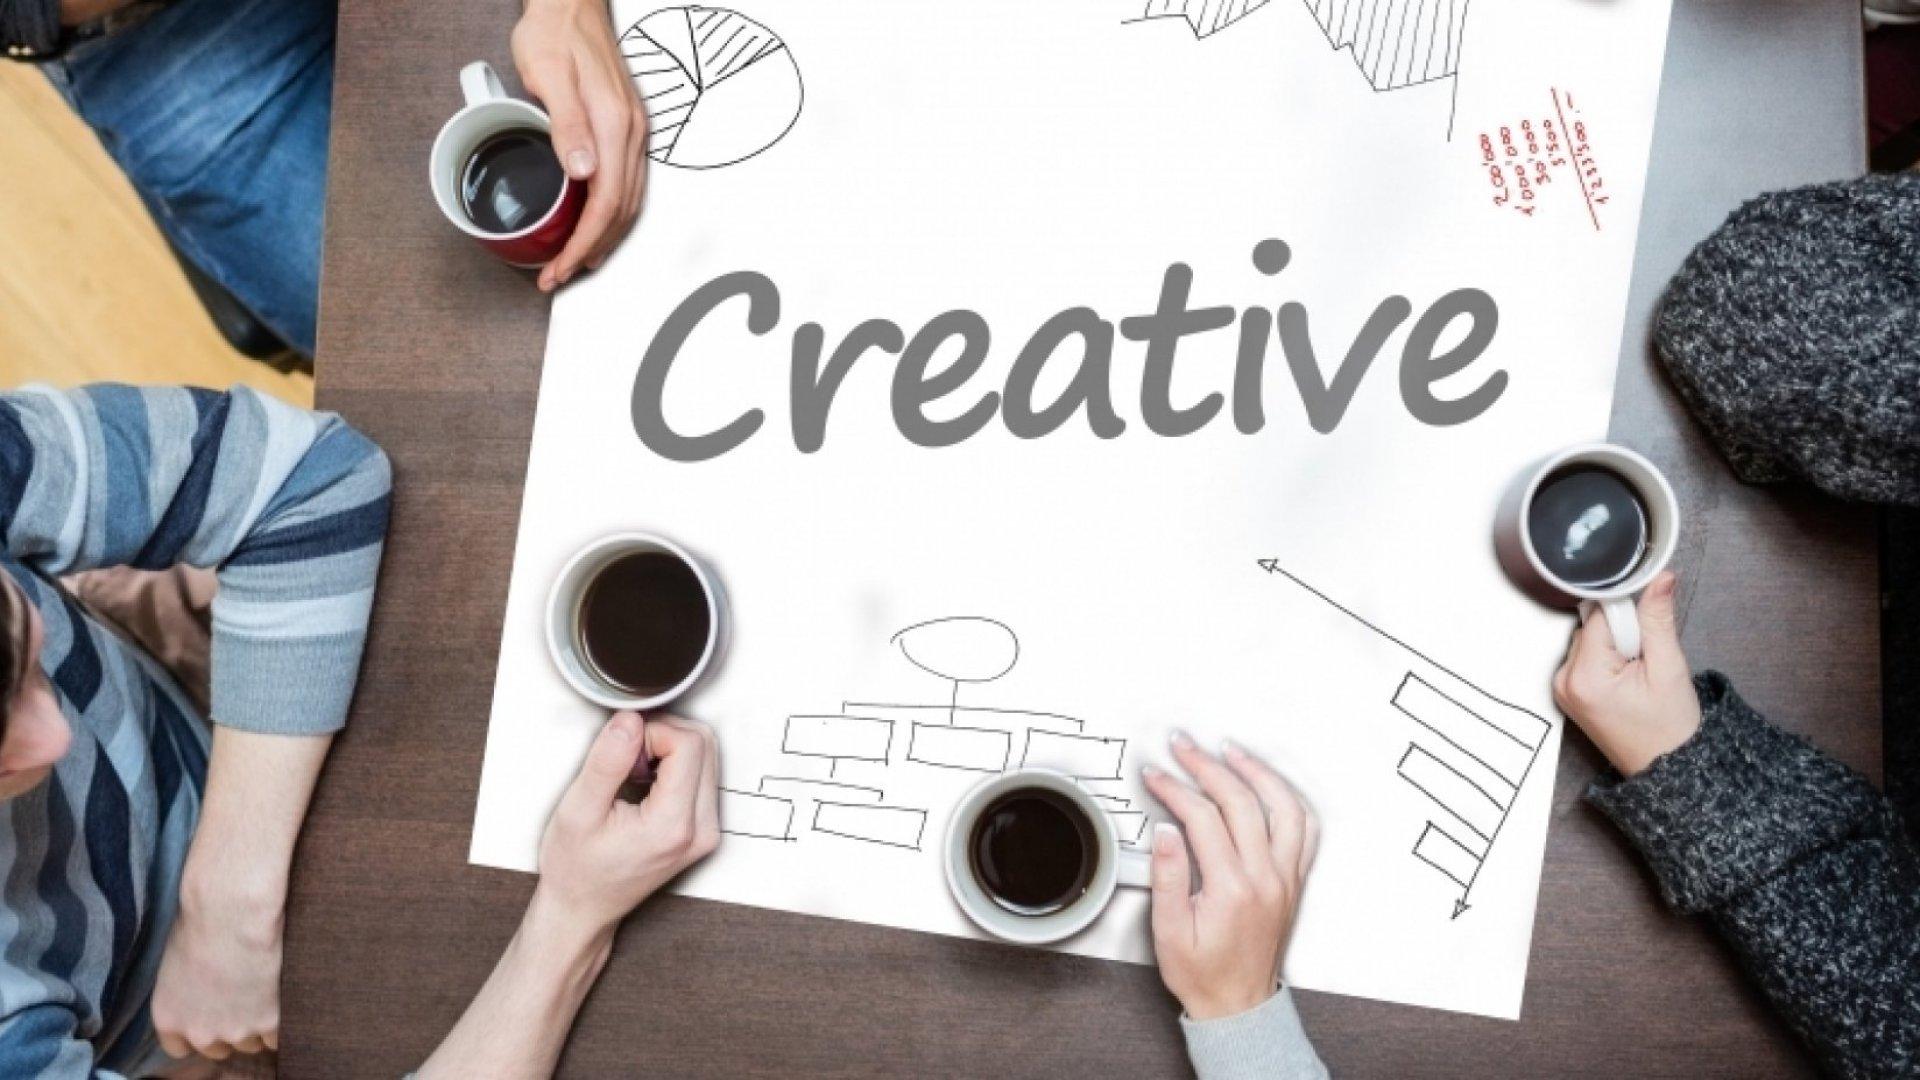 5 No-Brainer Ways to Brainstorm for Content